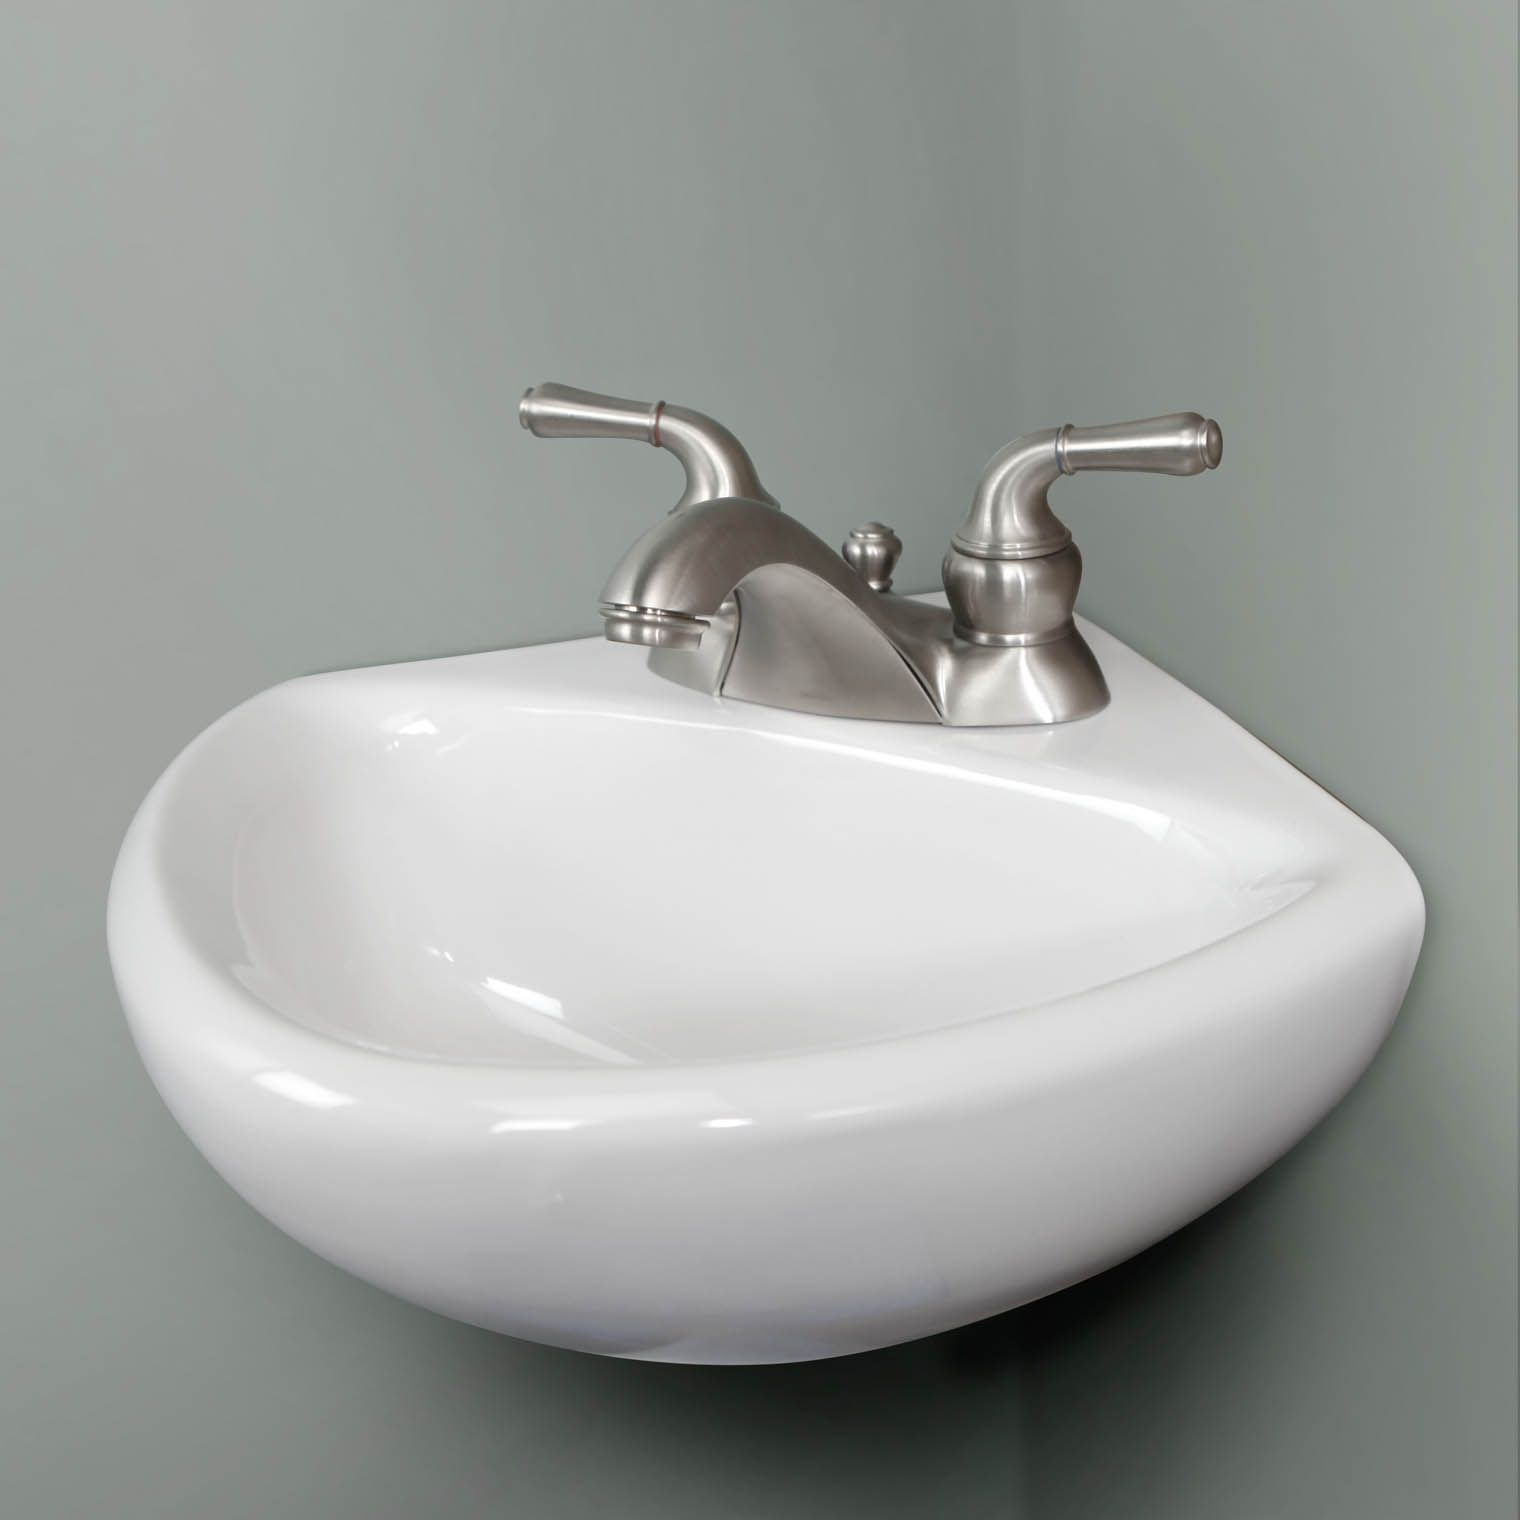 Buy American Standard 0451 021 020 Corner Minette 11 Wall Mount Bathroom Sink Wall Mounted Bathroom Sinks Small Bathroom Sinks Tiny Powder Rooms